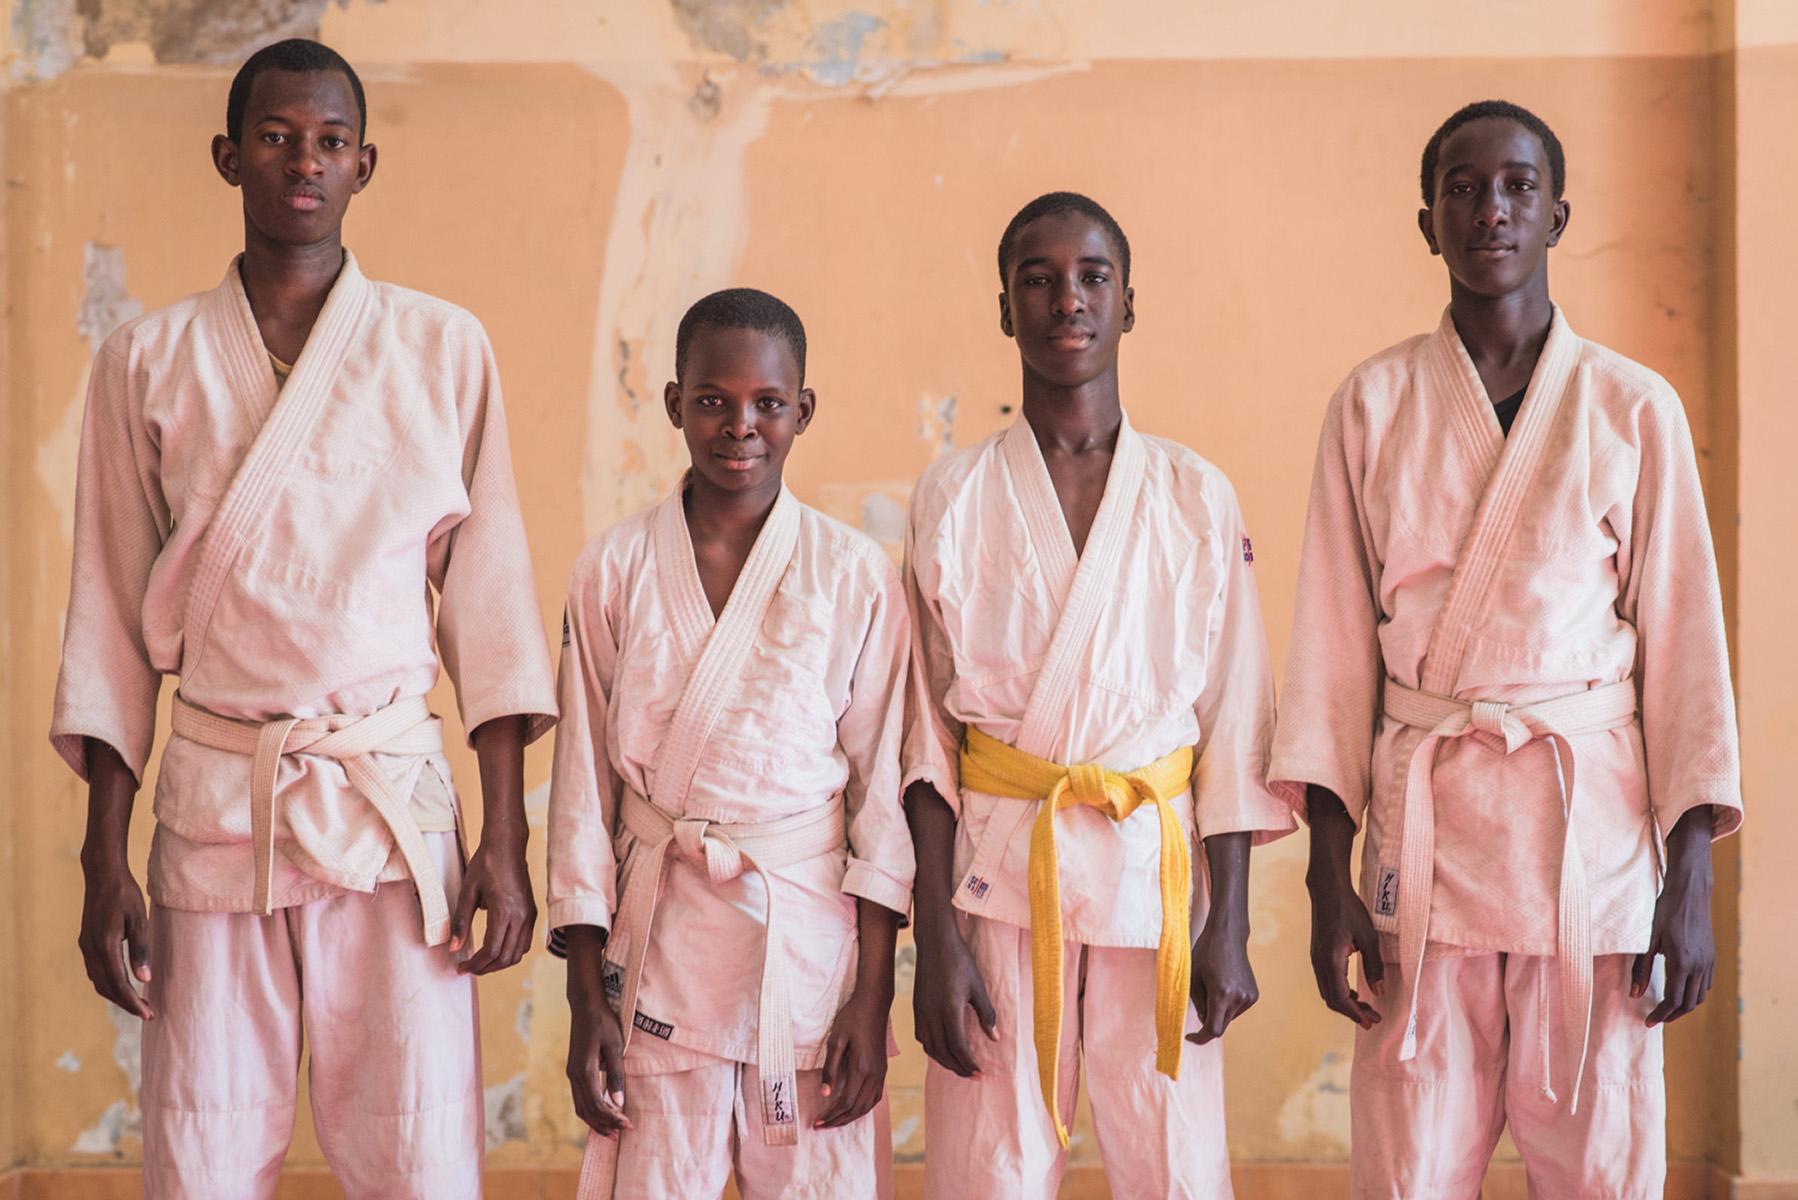 Aliou, Mouhamed, Moustapha & Abdoulaye